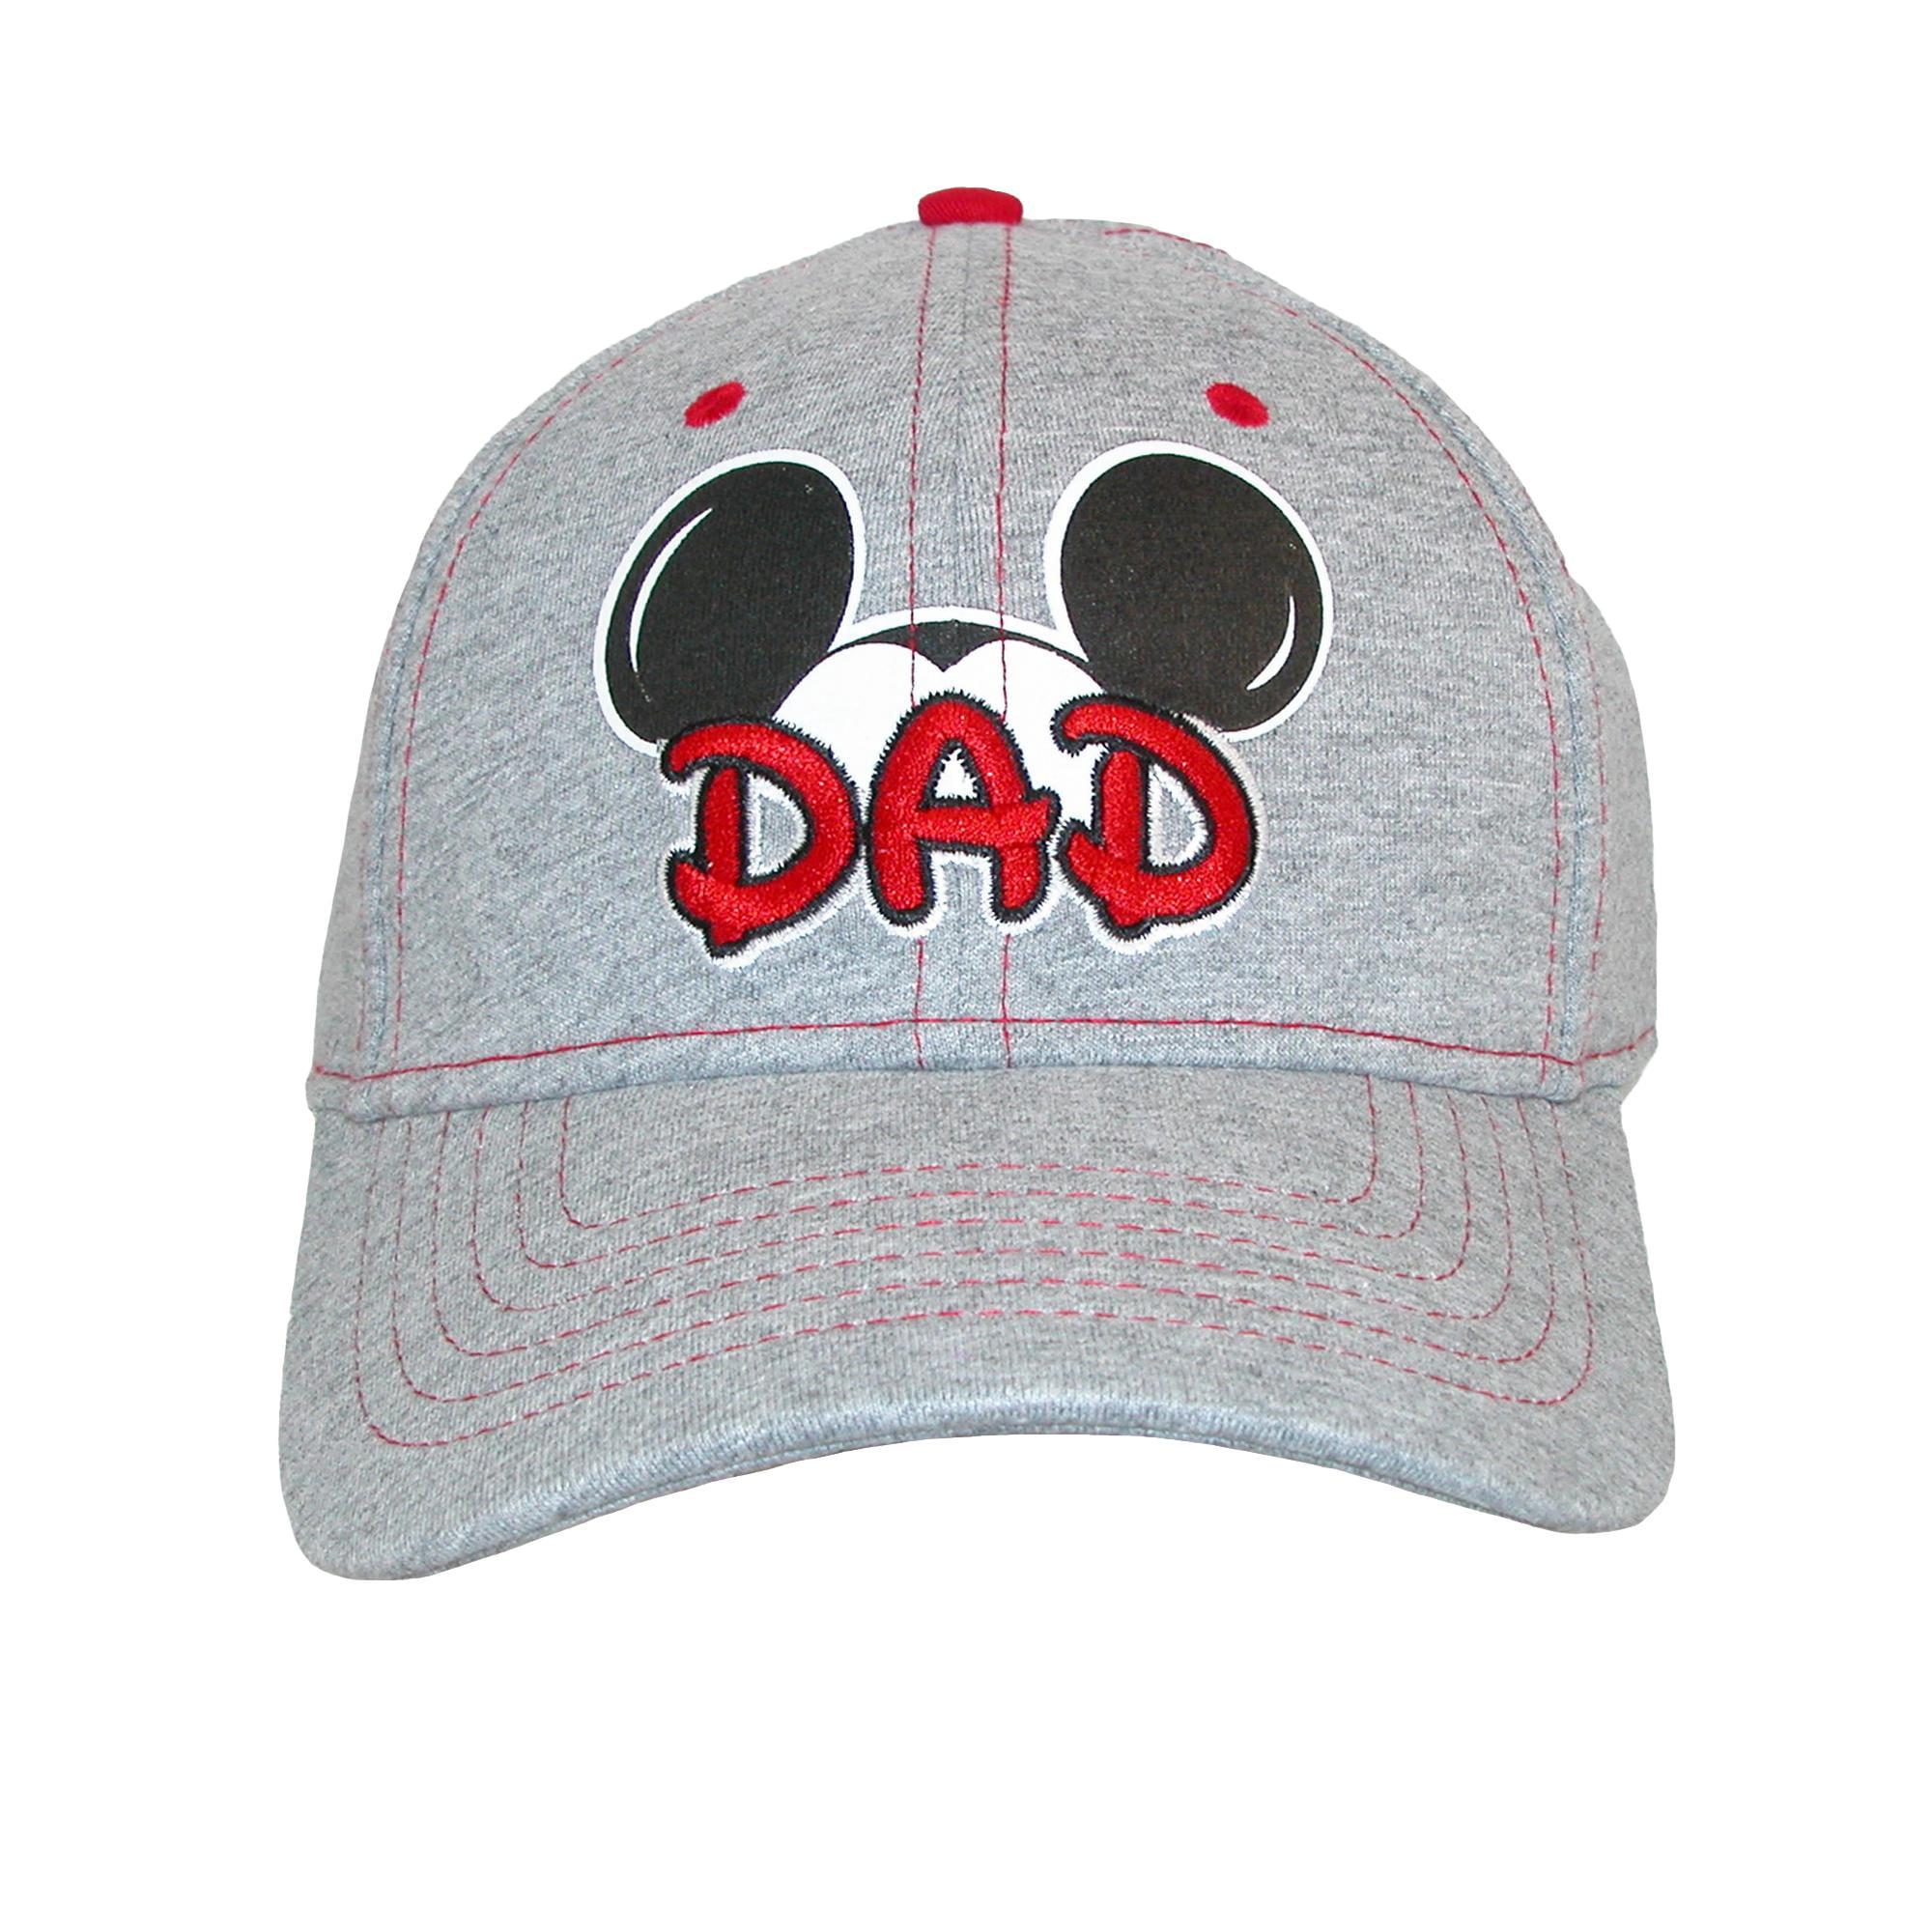 a2d357d1e8979 Disney Men s Cotton Mickey Mouse Dad Fan Baseball Cap